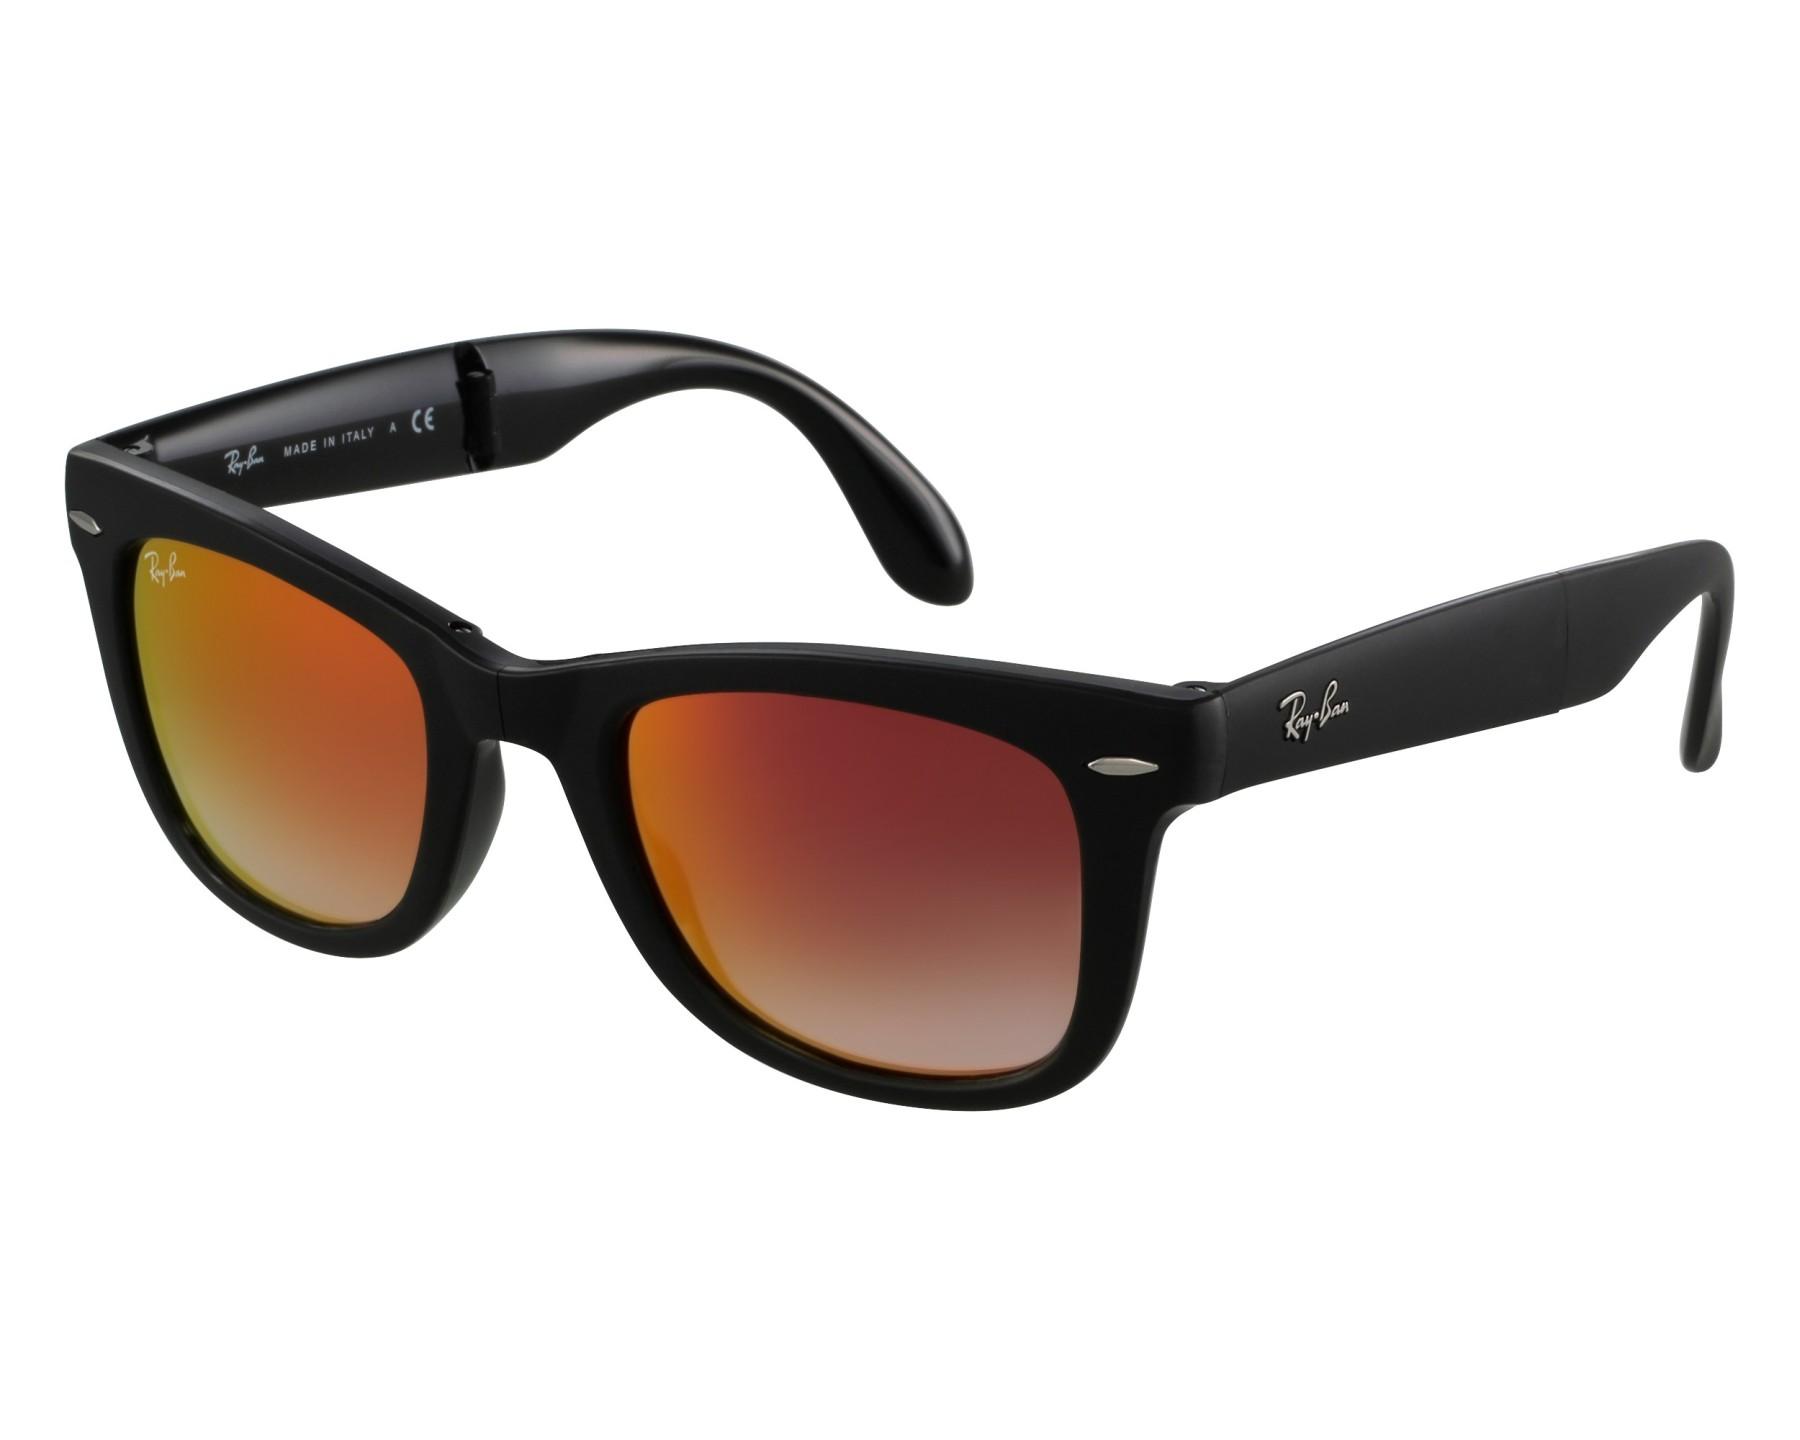 De 60694w Folding Ray Ban 4105 Rb Sol Classic Gafas Wayfarer 29HEDWI